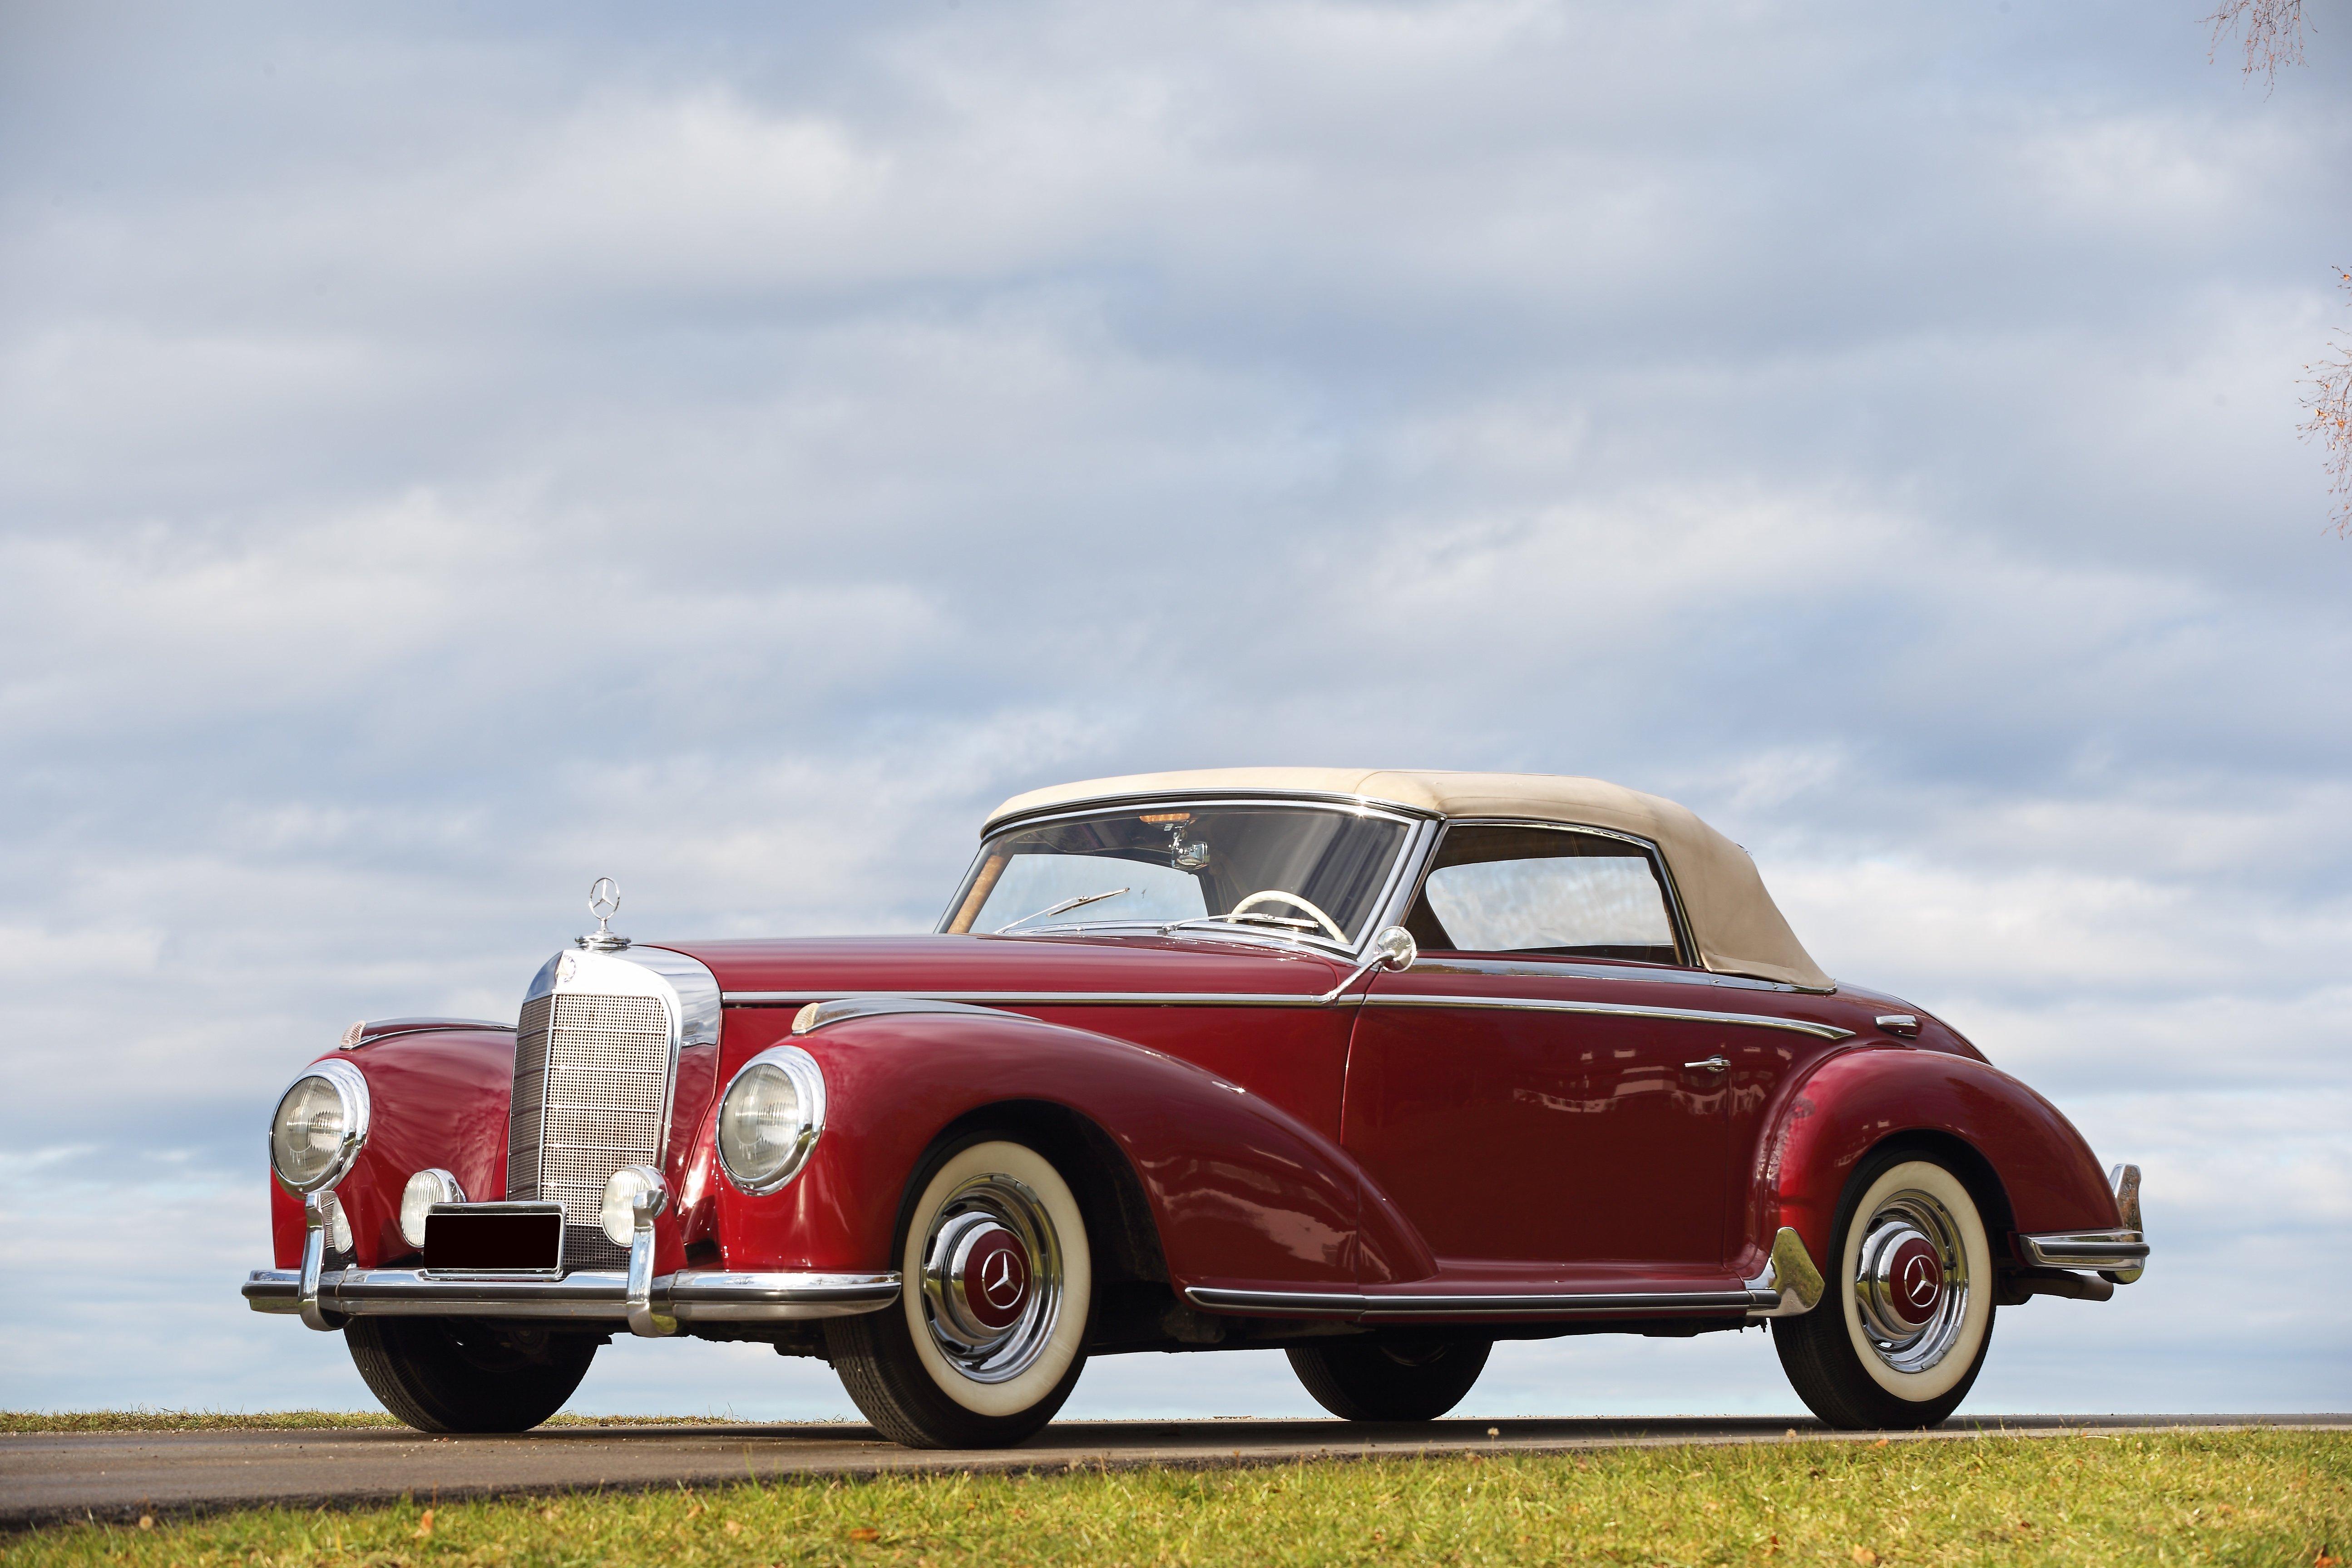 1953 mercedes benz 300 s roadster ex rosso bianco classic driver market. Black Bedroom Furniture Sets. Home Design Ideas